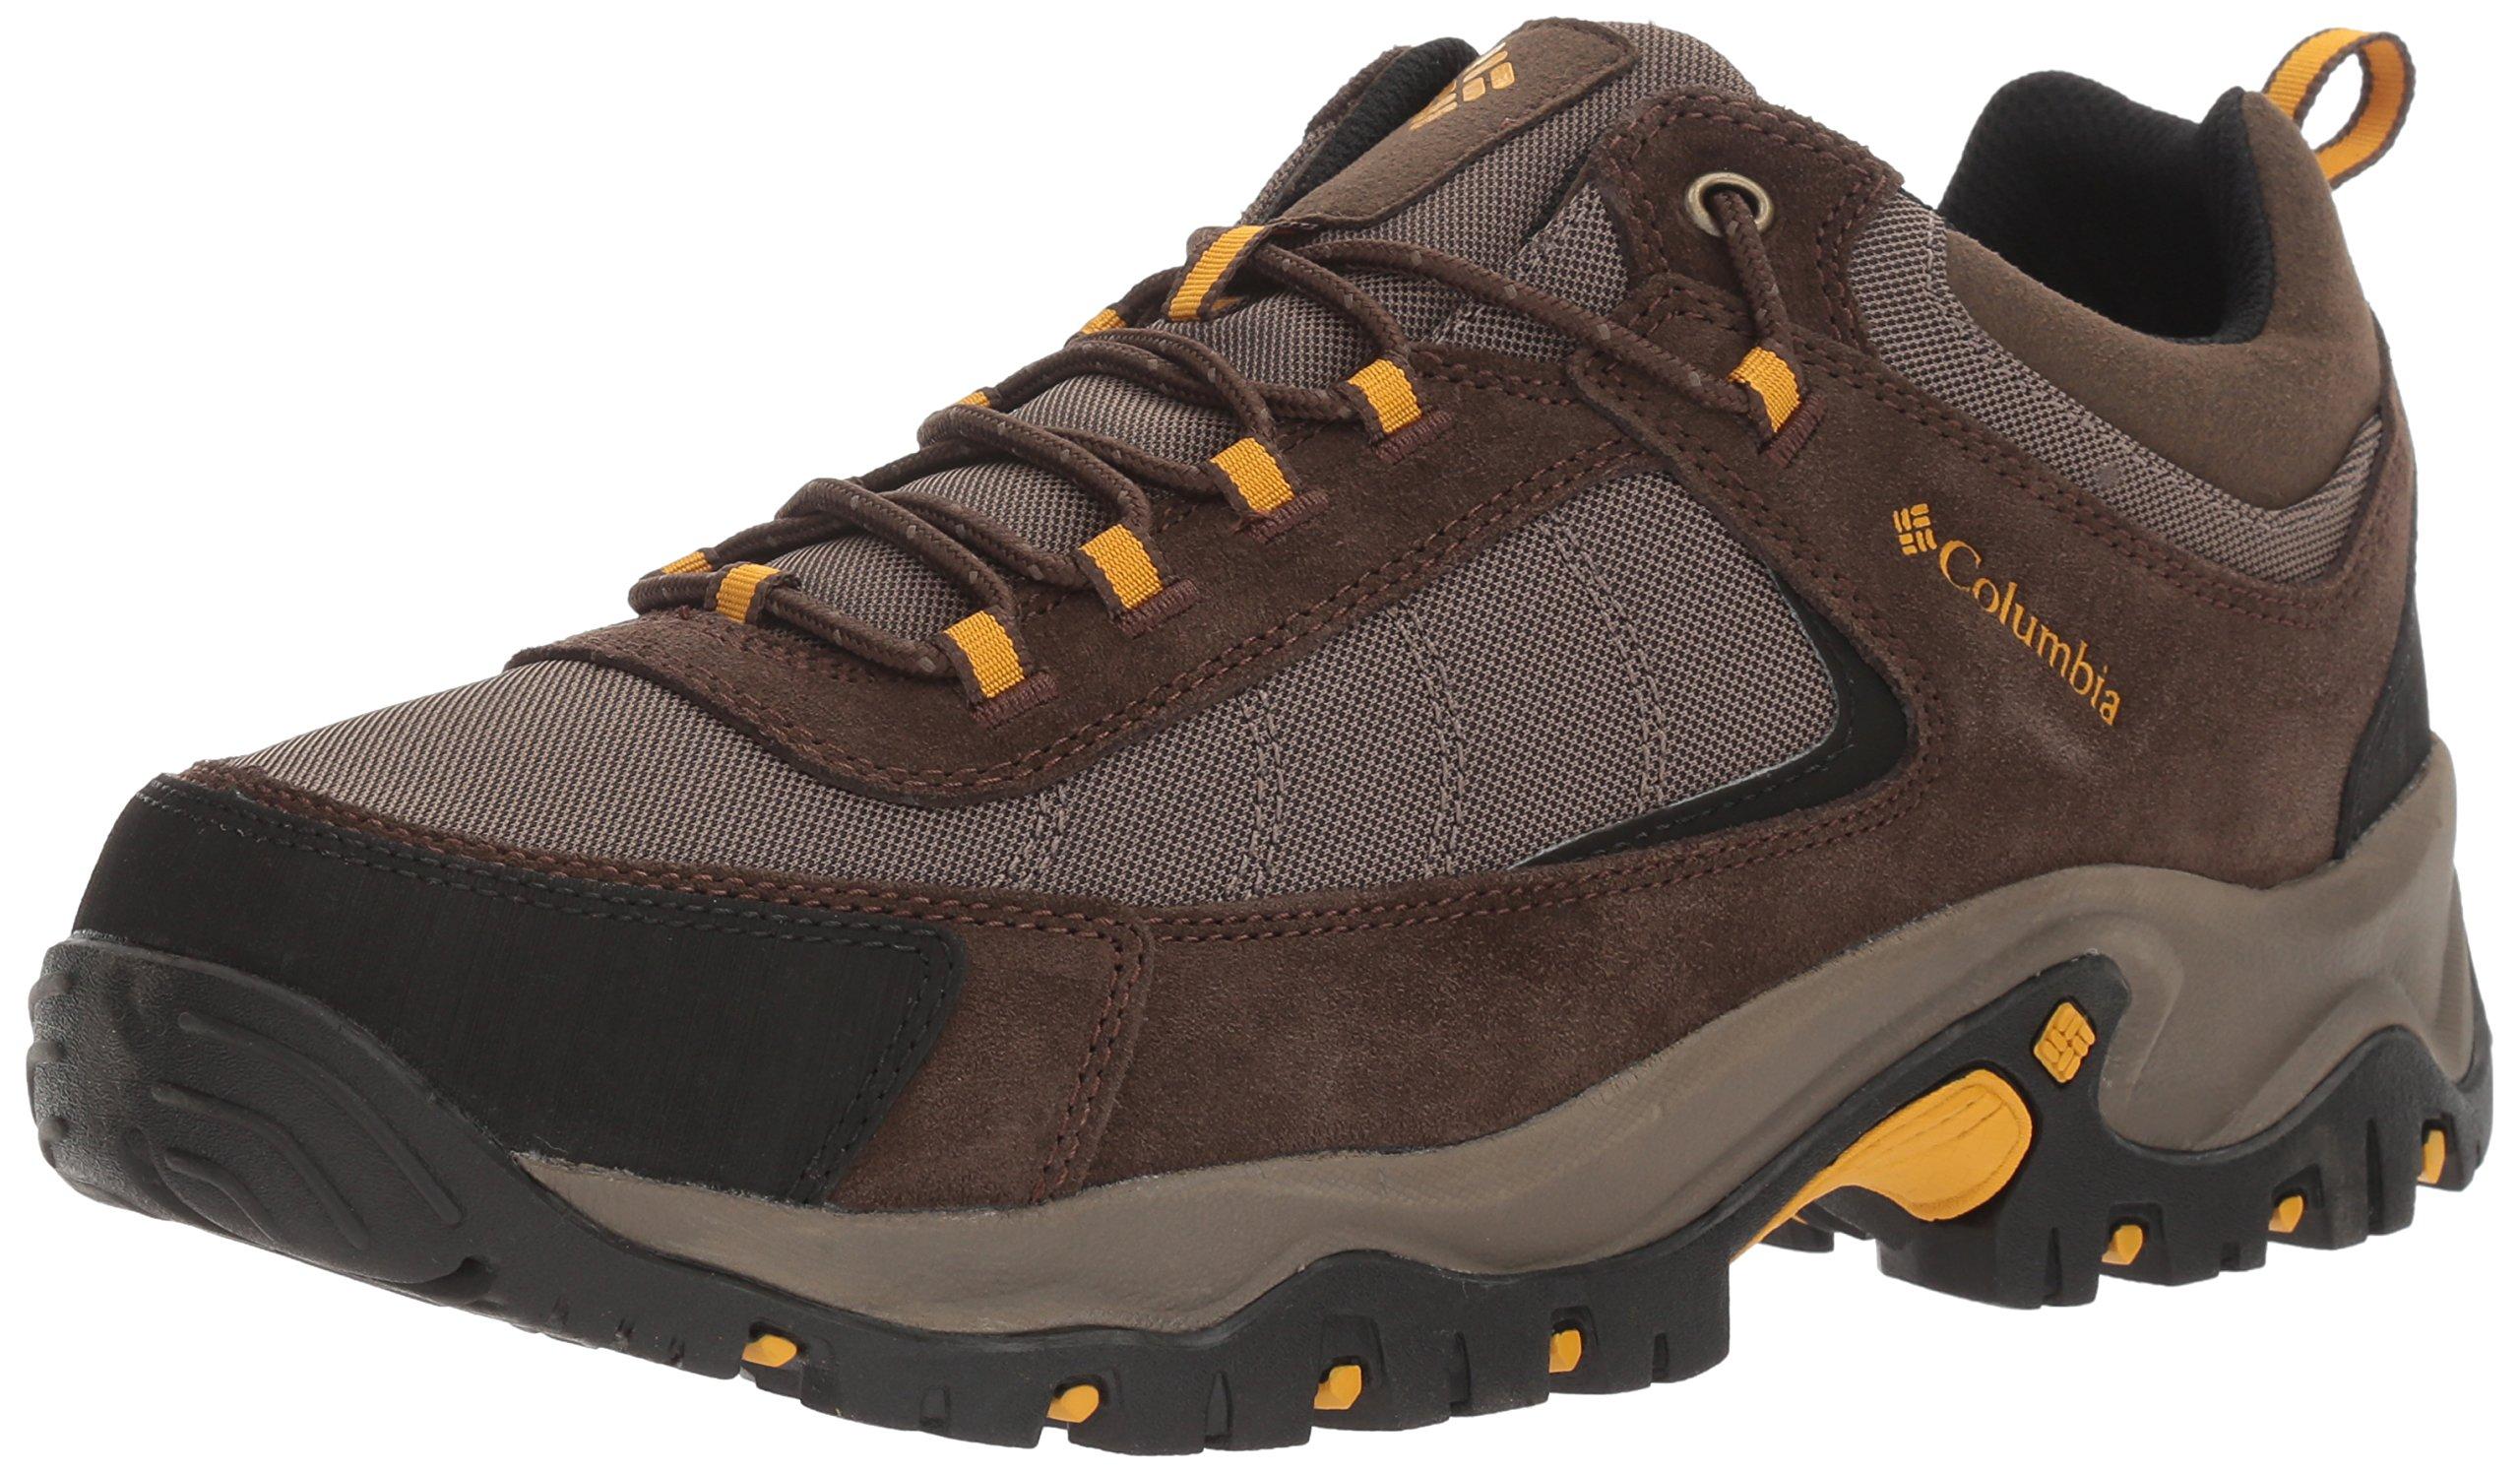 Columbia Men's Granite Ridge Hiking Shoe, Mud, Golden Yellow, 13 D US